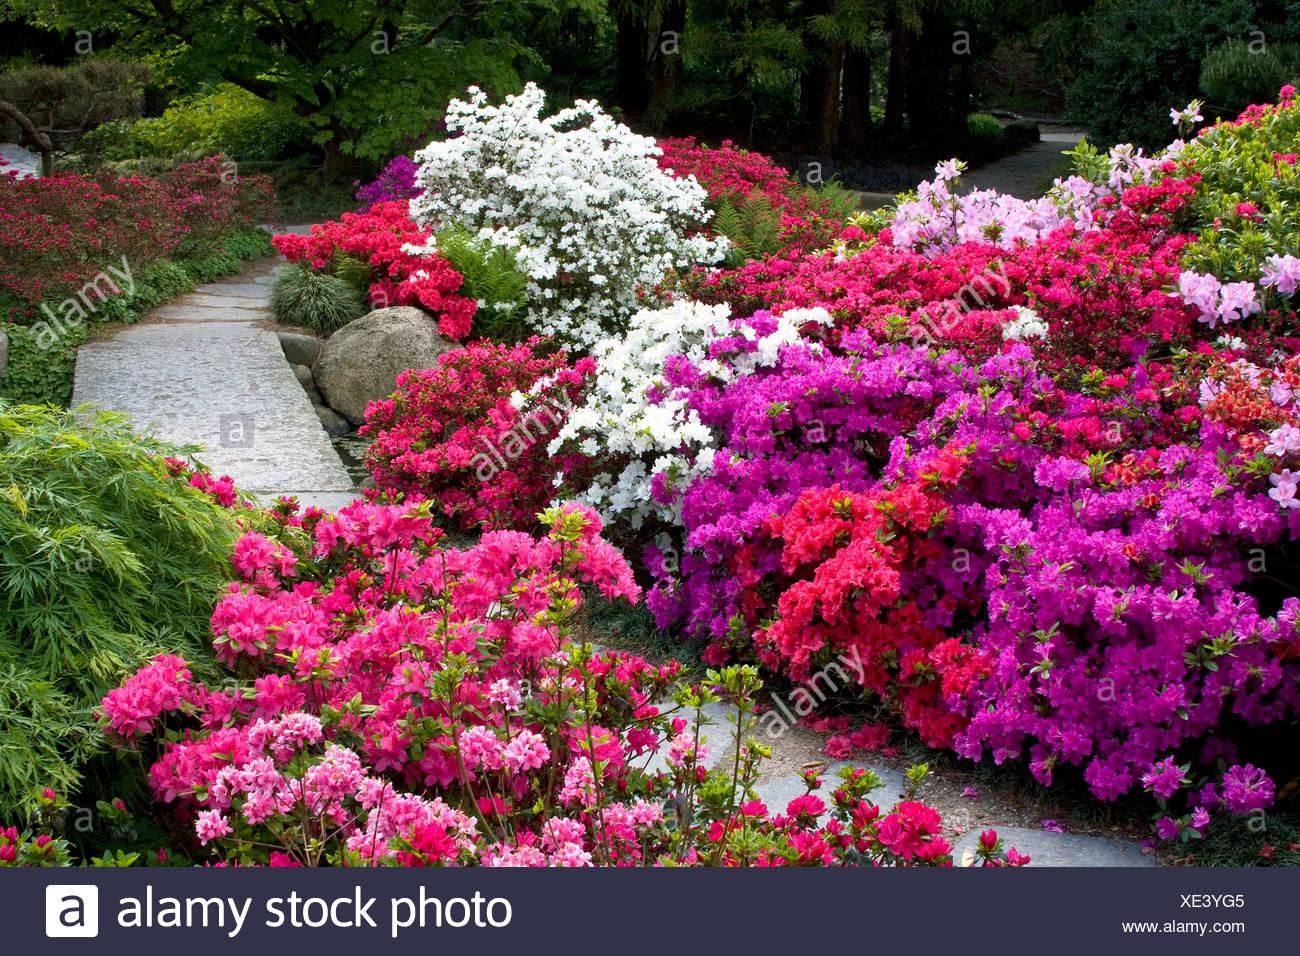 Rhododendrons, Azaleas (Rhododendron spec.) Japanese Garden in the Botanic Garden in Hamburg, Germany, Europe - Stock Image